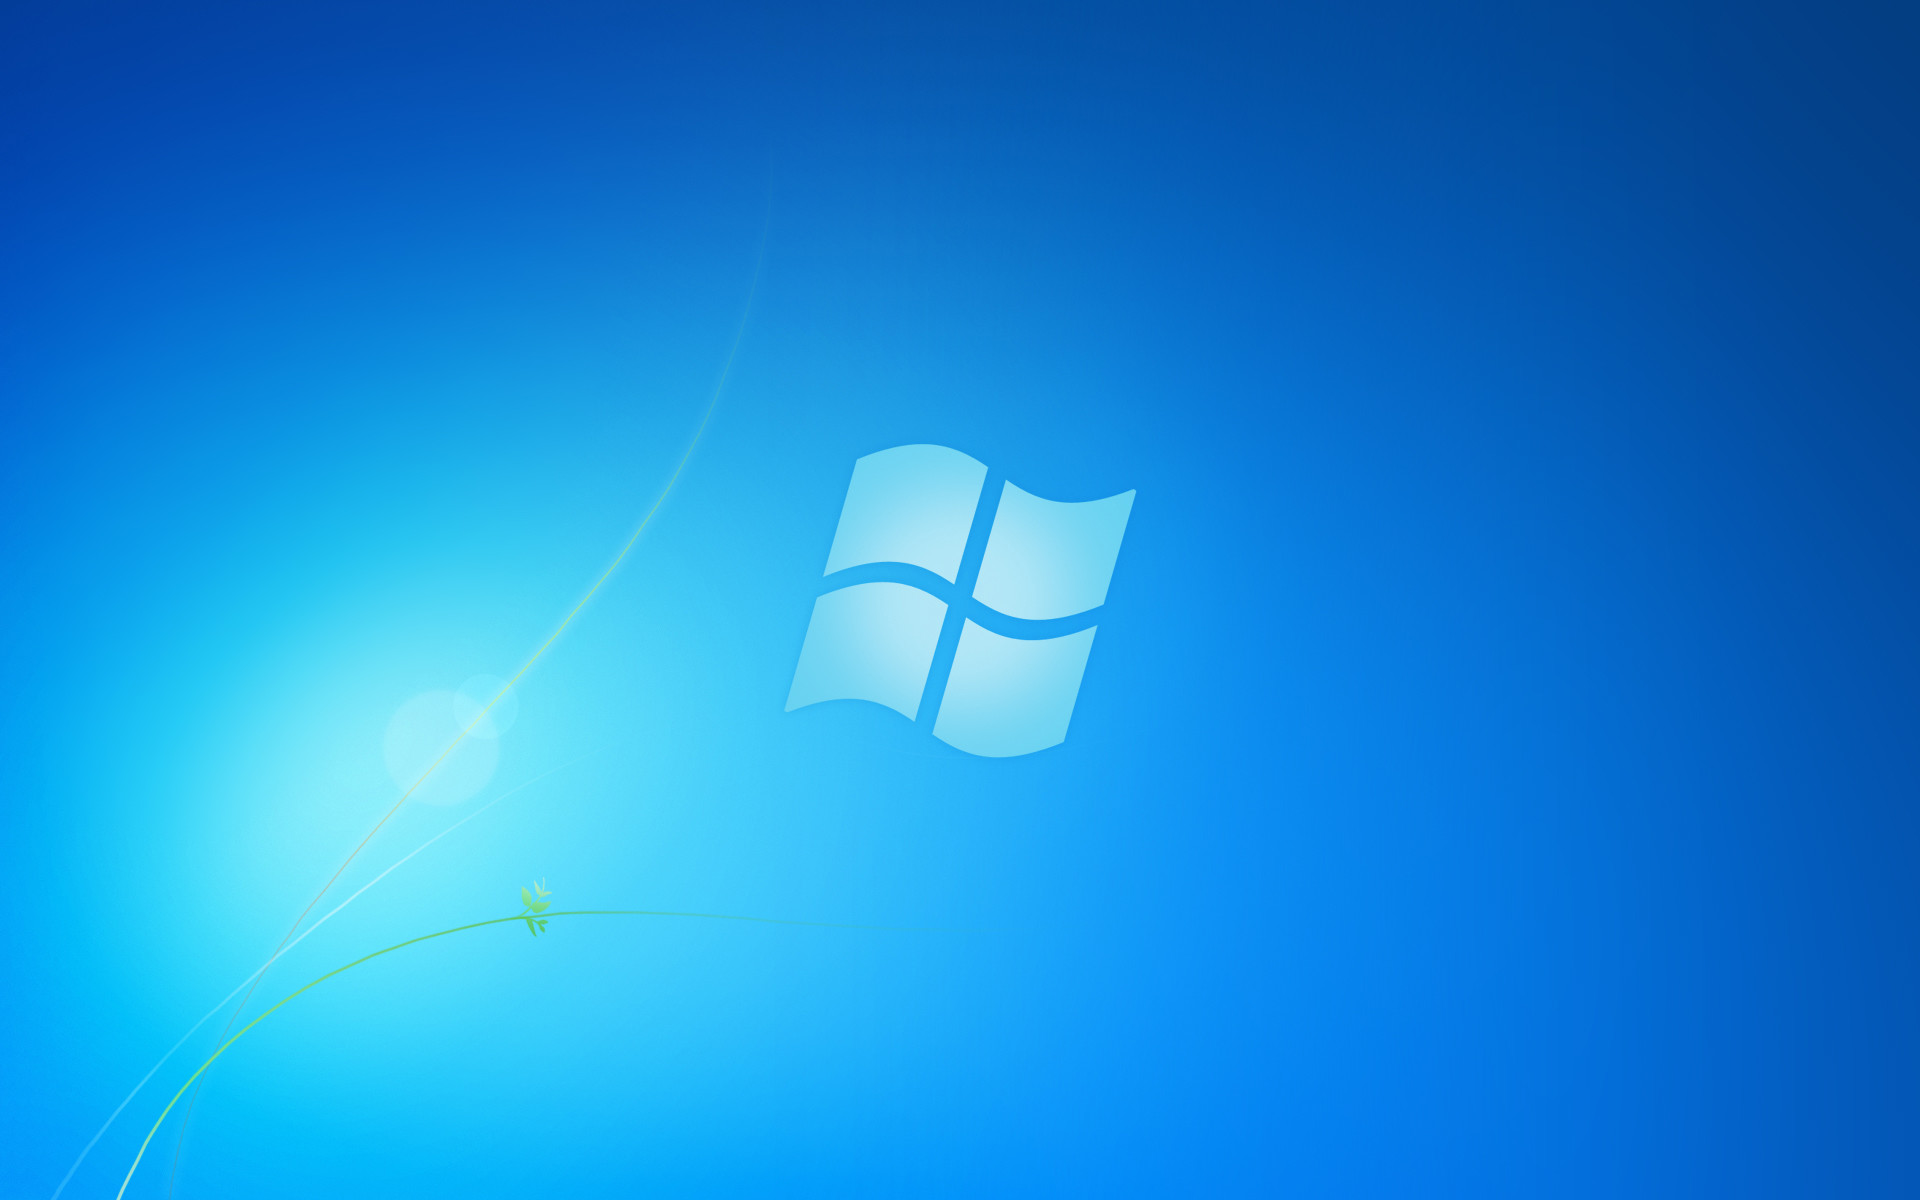 windows 7 wallpaper 1366x768 ·①